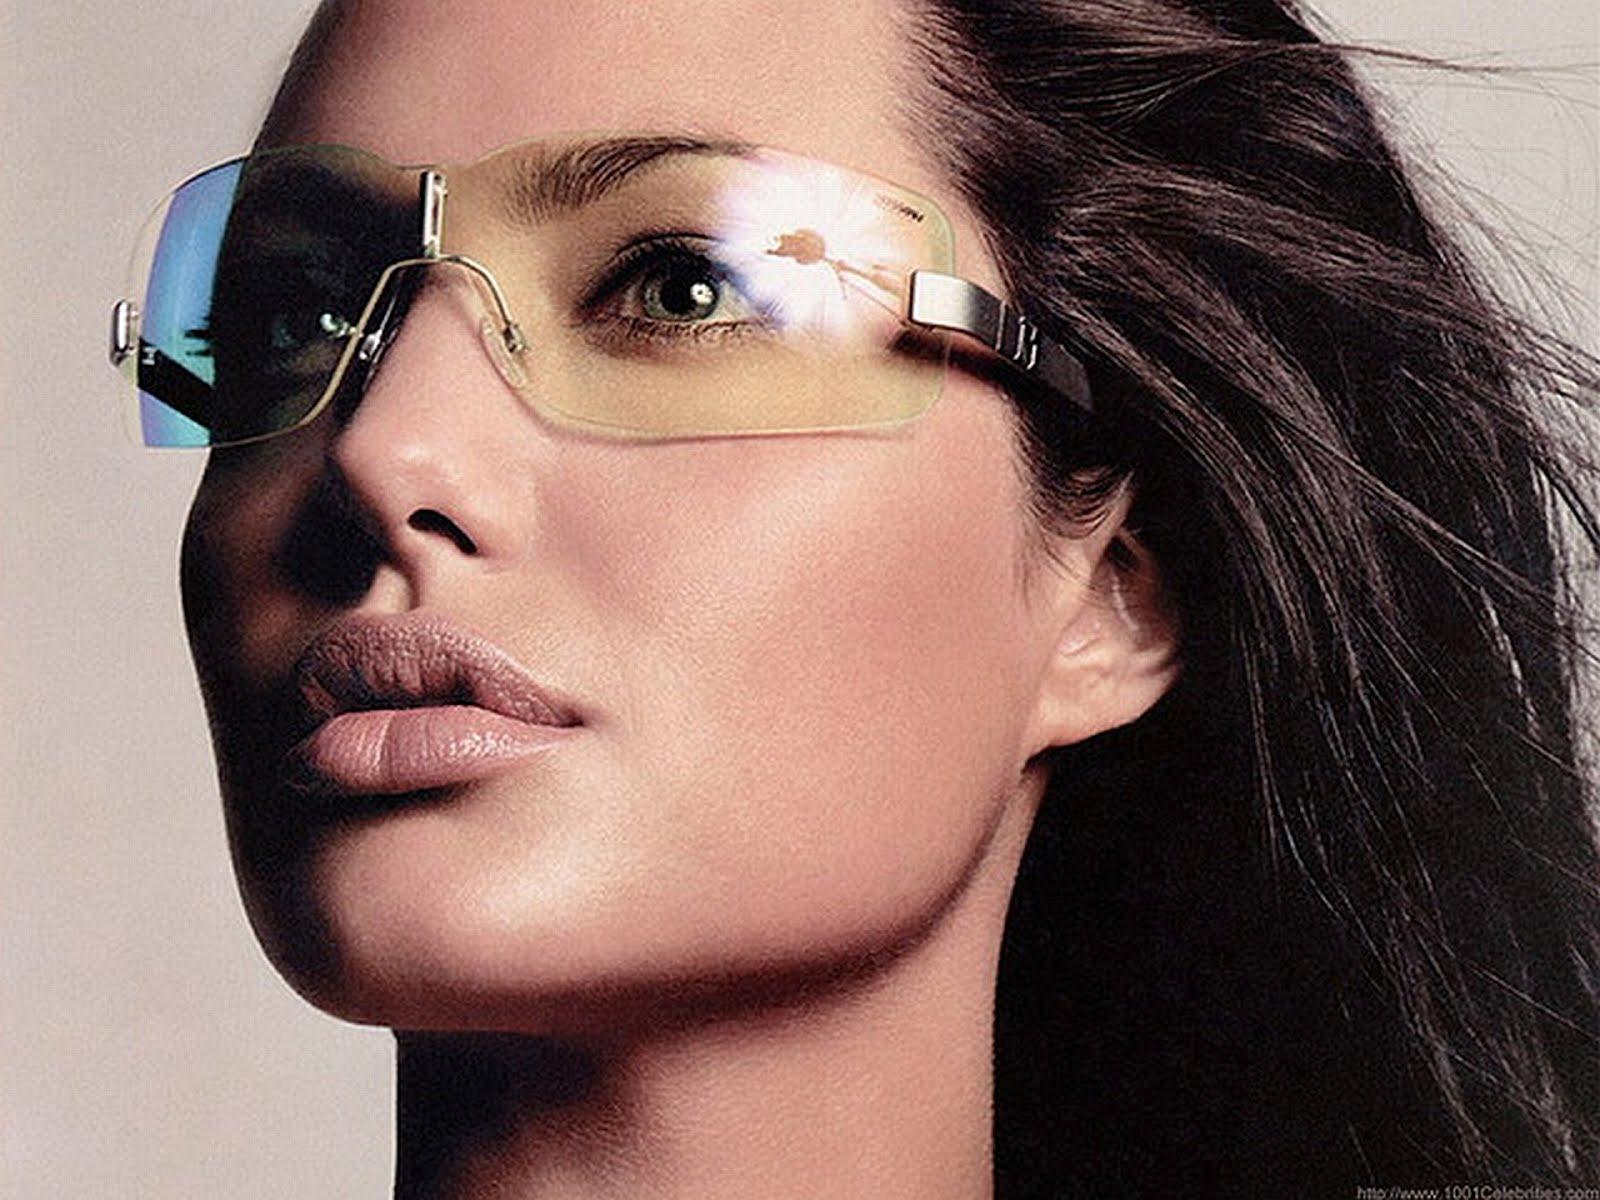 Girls Pictures Video Angelina Jolie Hot Emo Girl Japanese Rain Goggles Wallpaper-5640